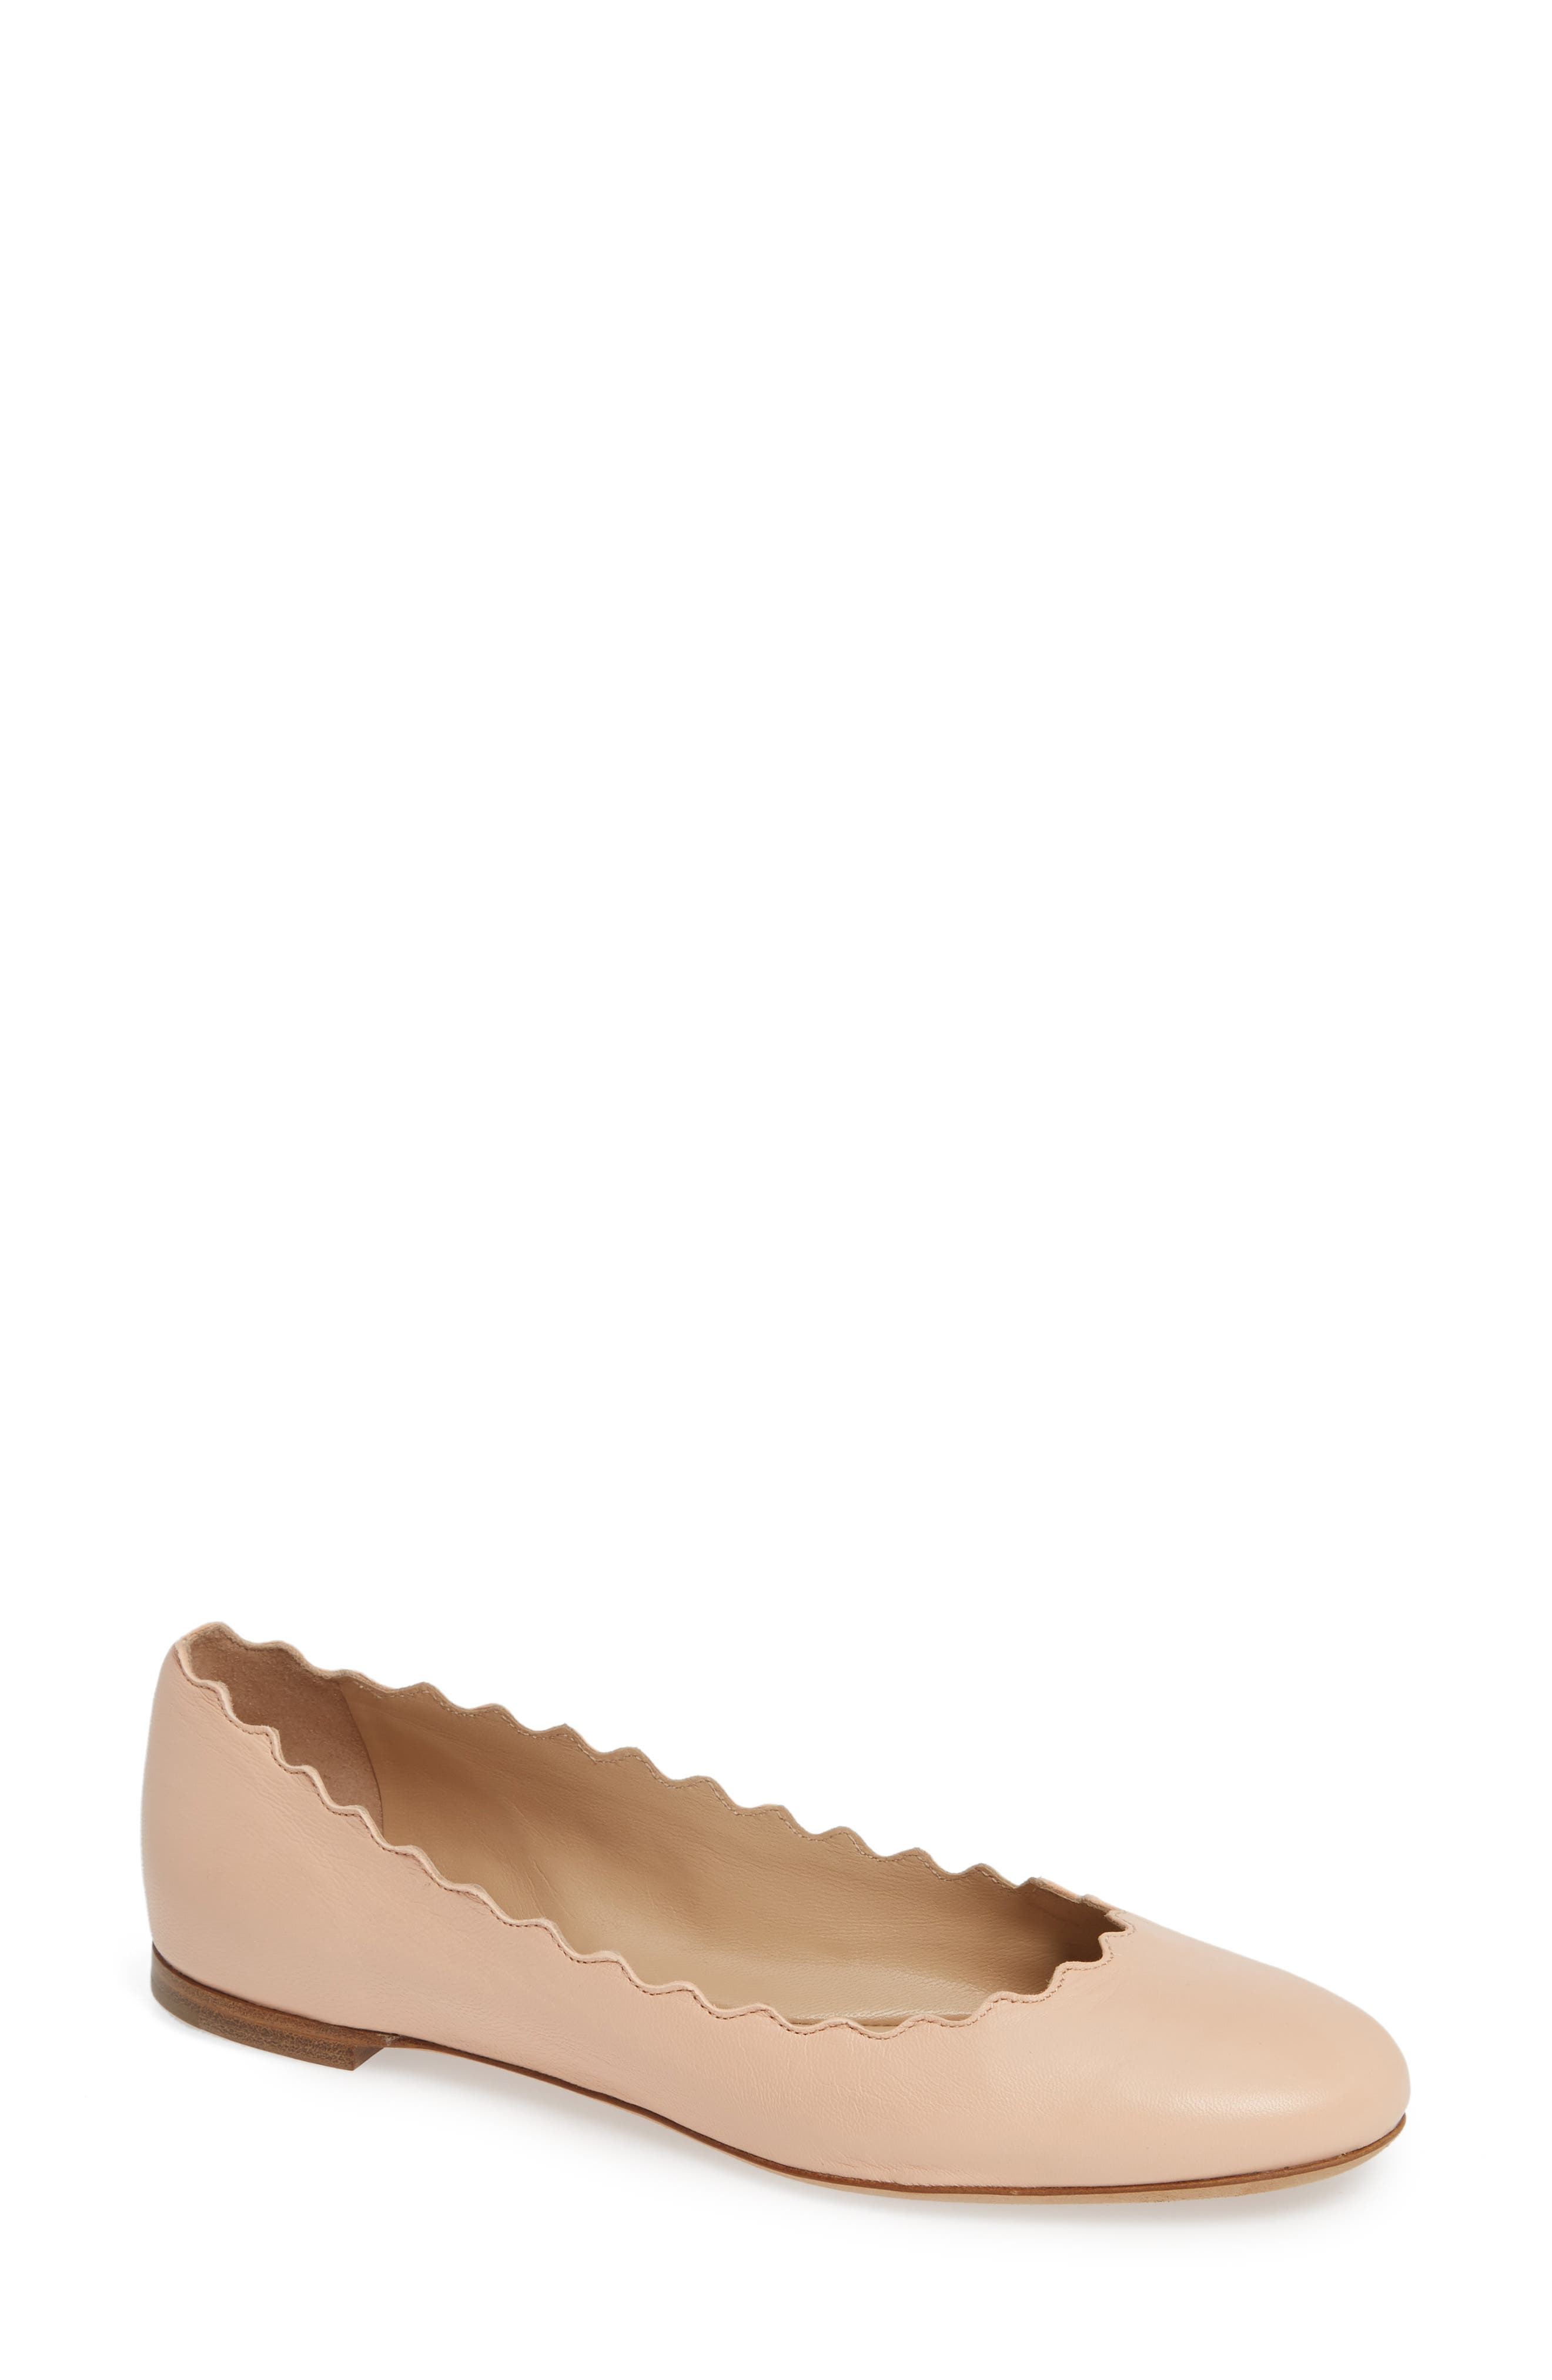 'Lauren' Scalloped Ballet Flat,                             Main thumbnail 1, color,                             DELICATE PINK LEATHER